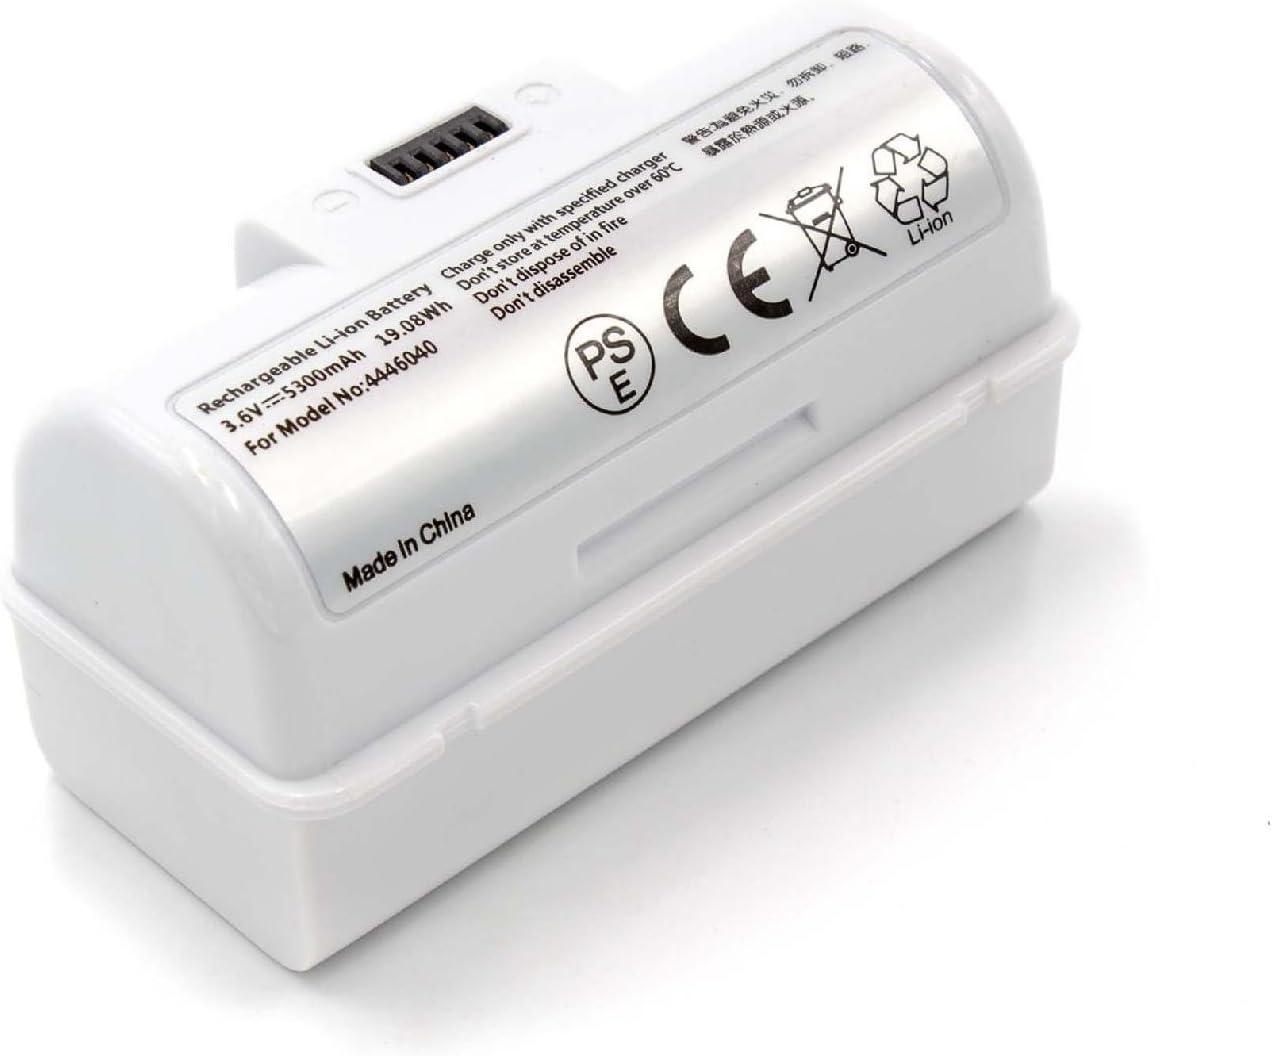 INTENSILO Batería compatible con iRobot Braava Jet 245, 250, M6, Jet M6110, M6134 robot limpiasuelos, robot doméstico (5300mAh, 3.6V, Li-Ion): Amazon.es: Hogar